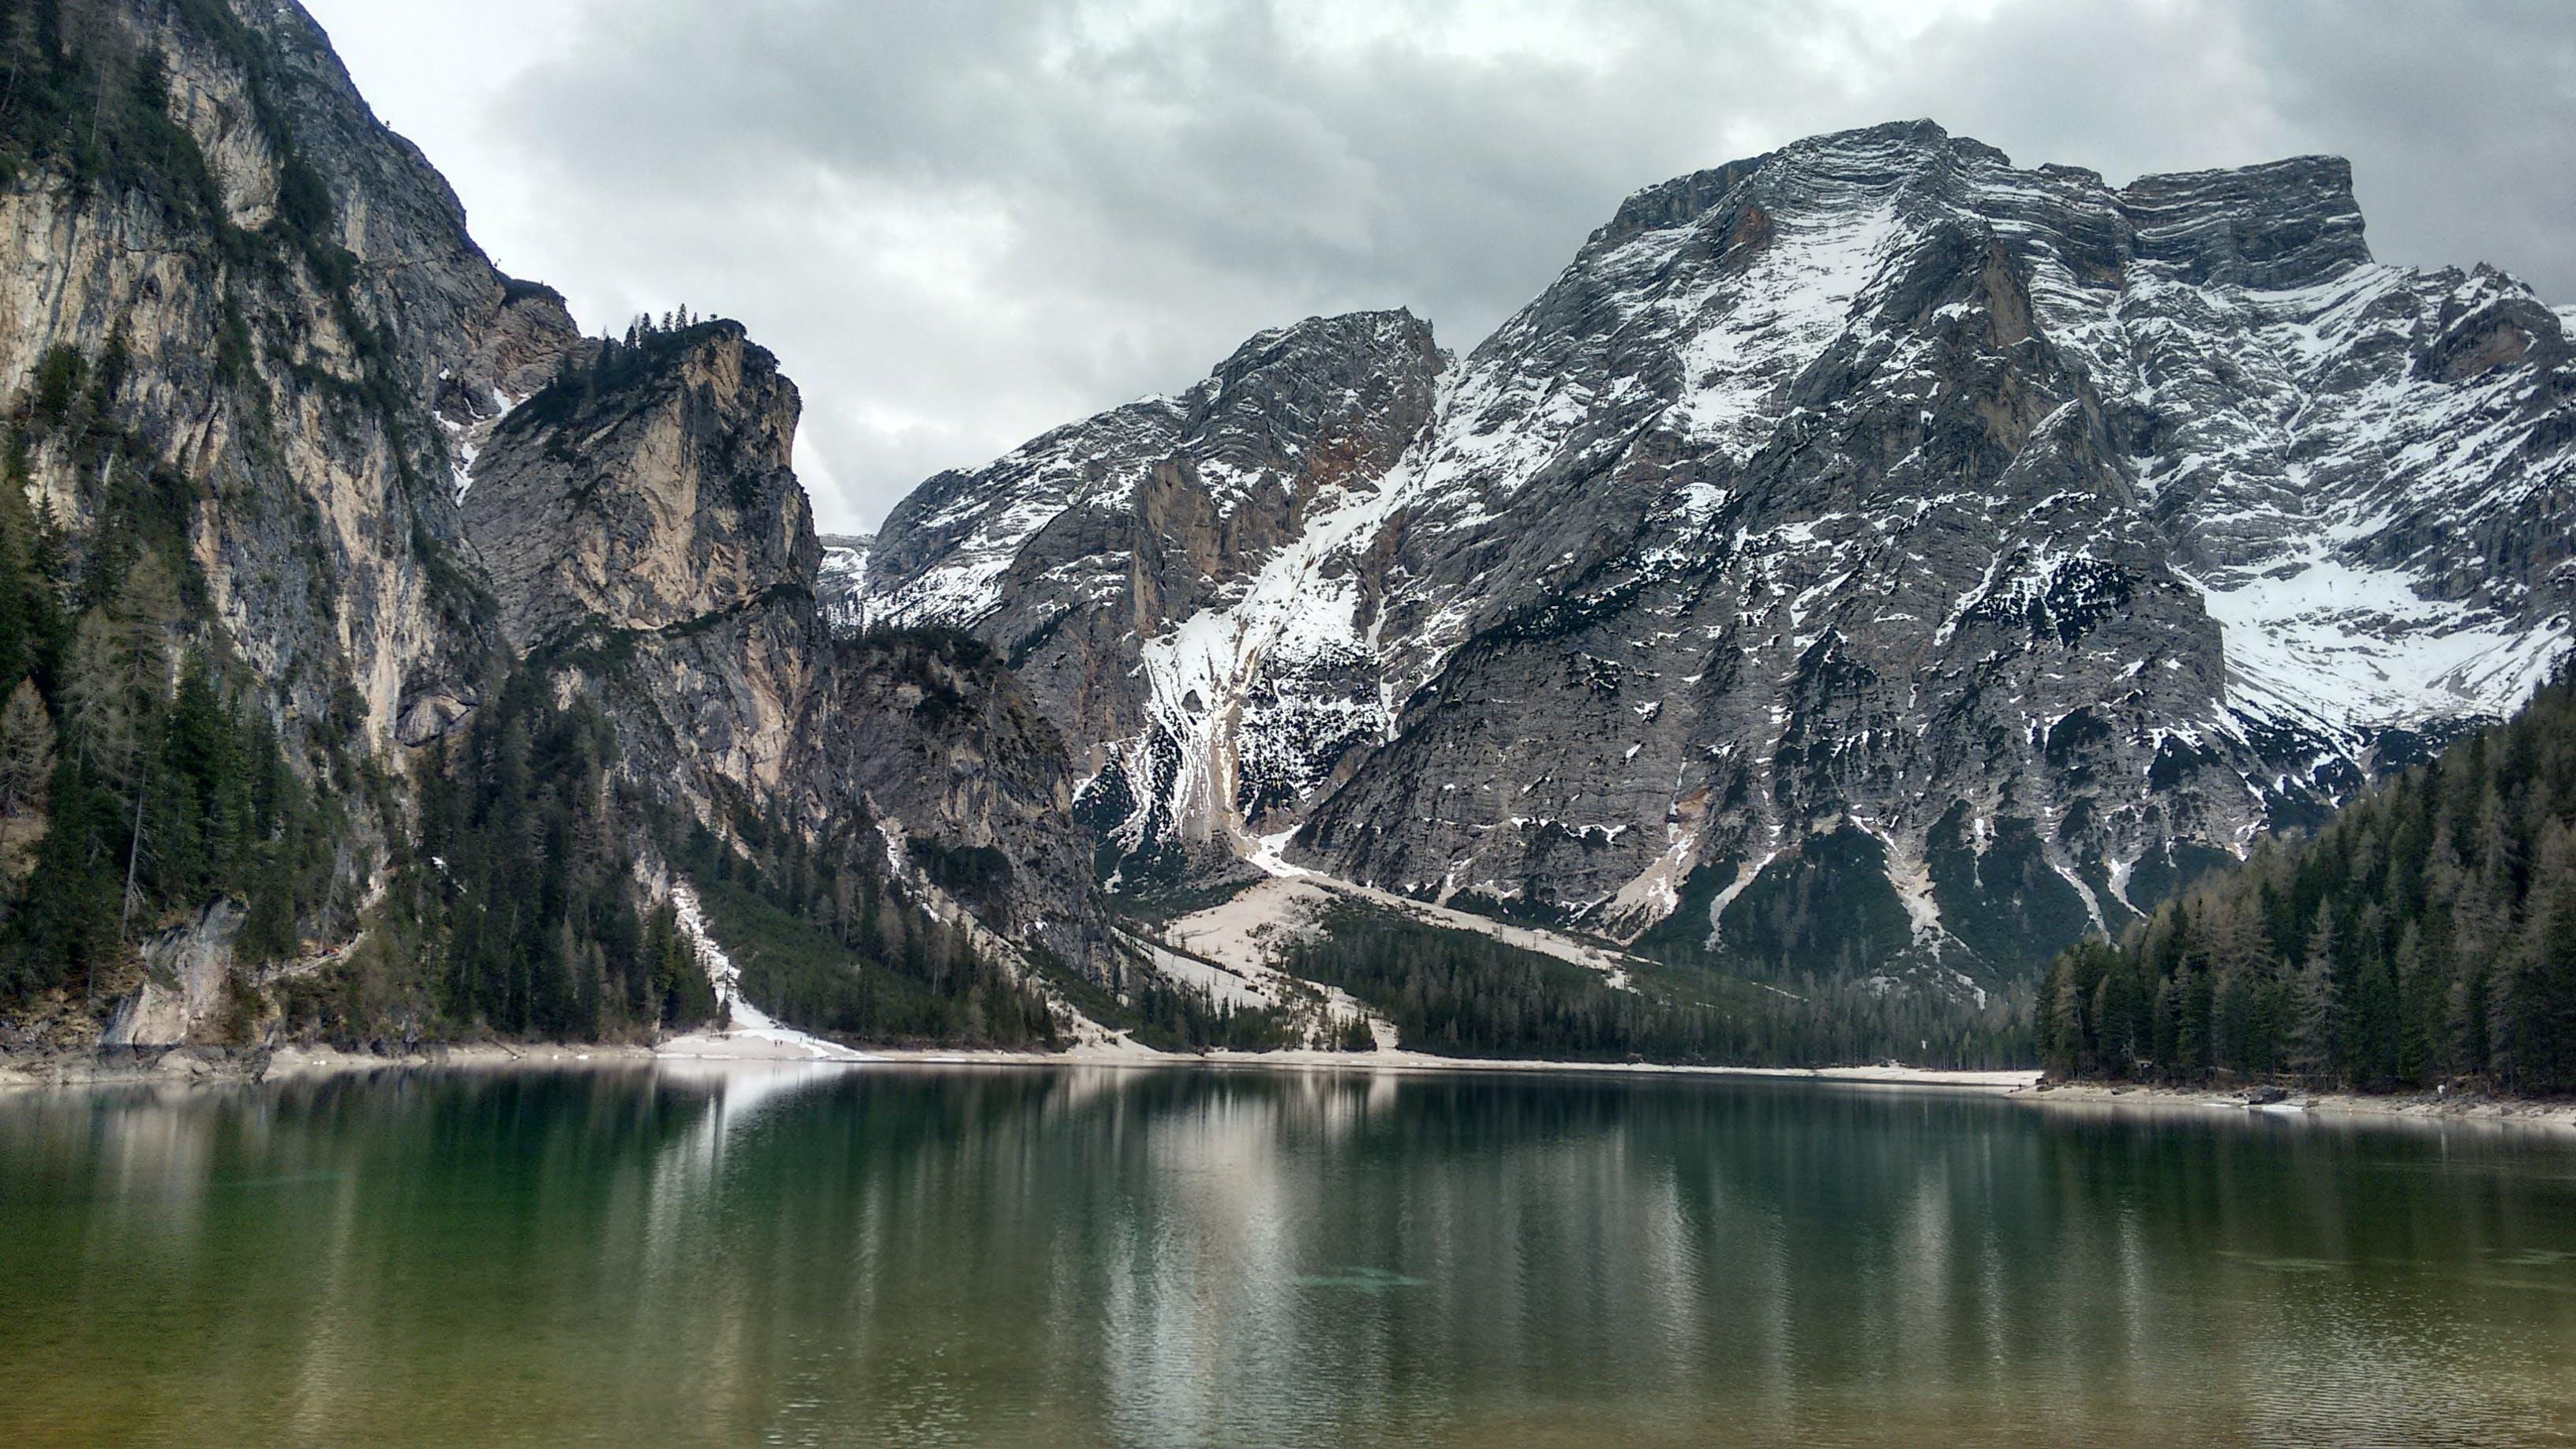 Snow Mountain Under Gray Cloudy Sky